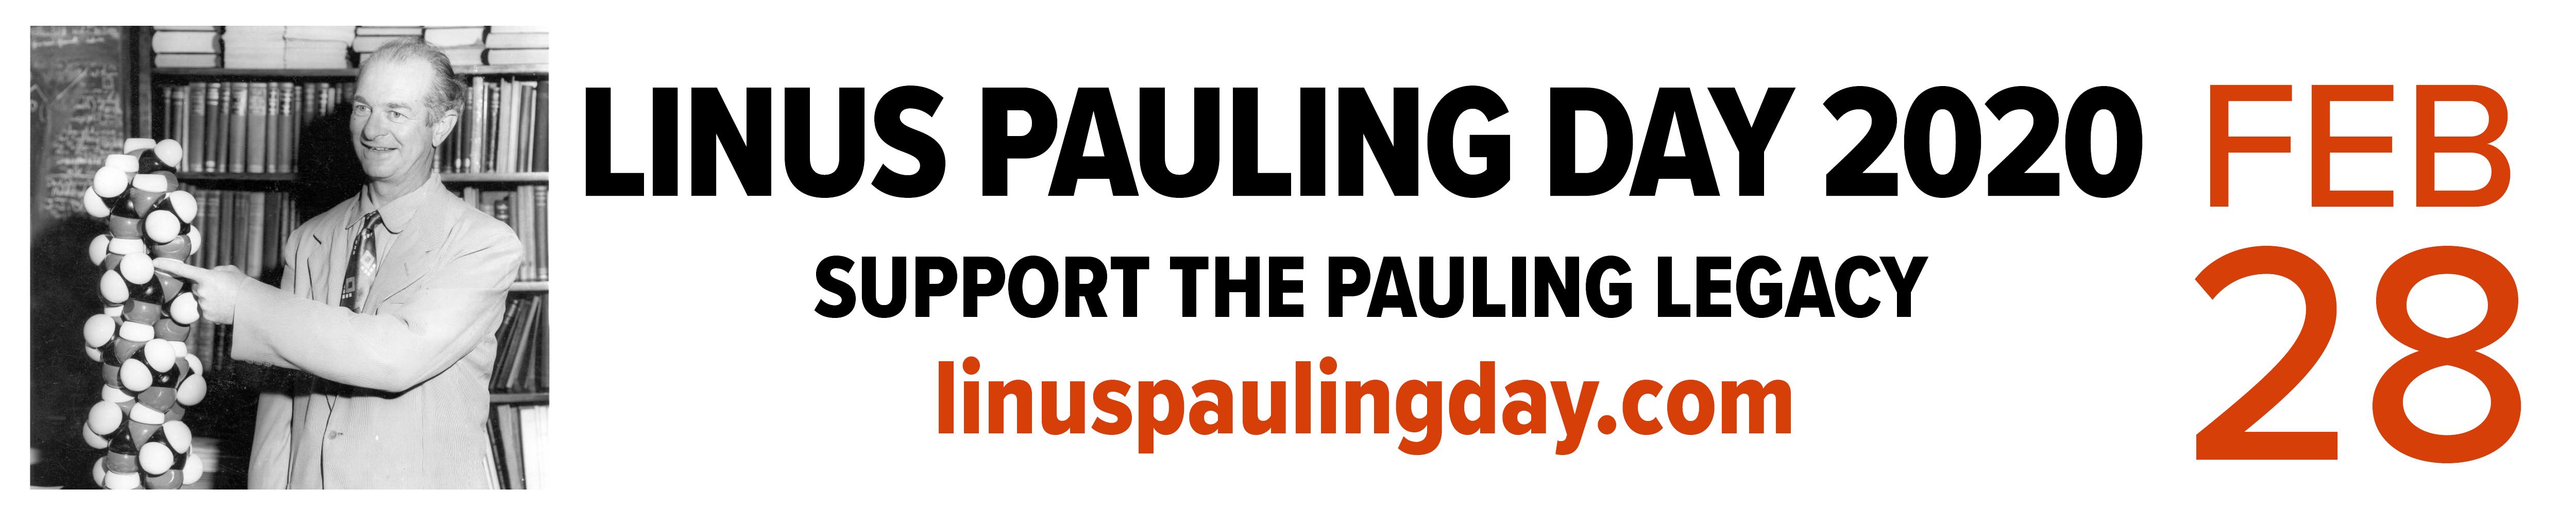 Linus Pauling Day